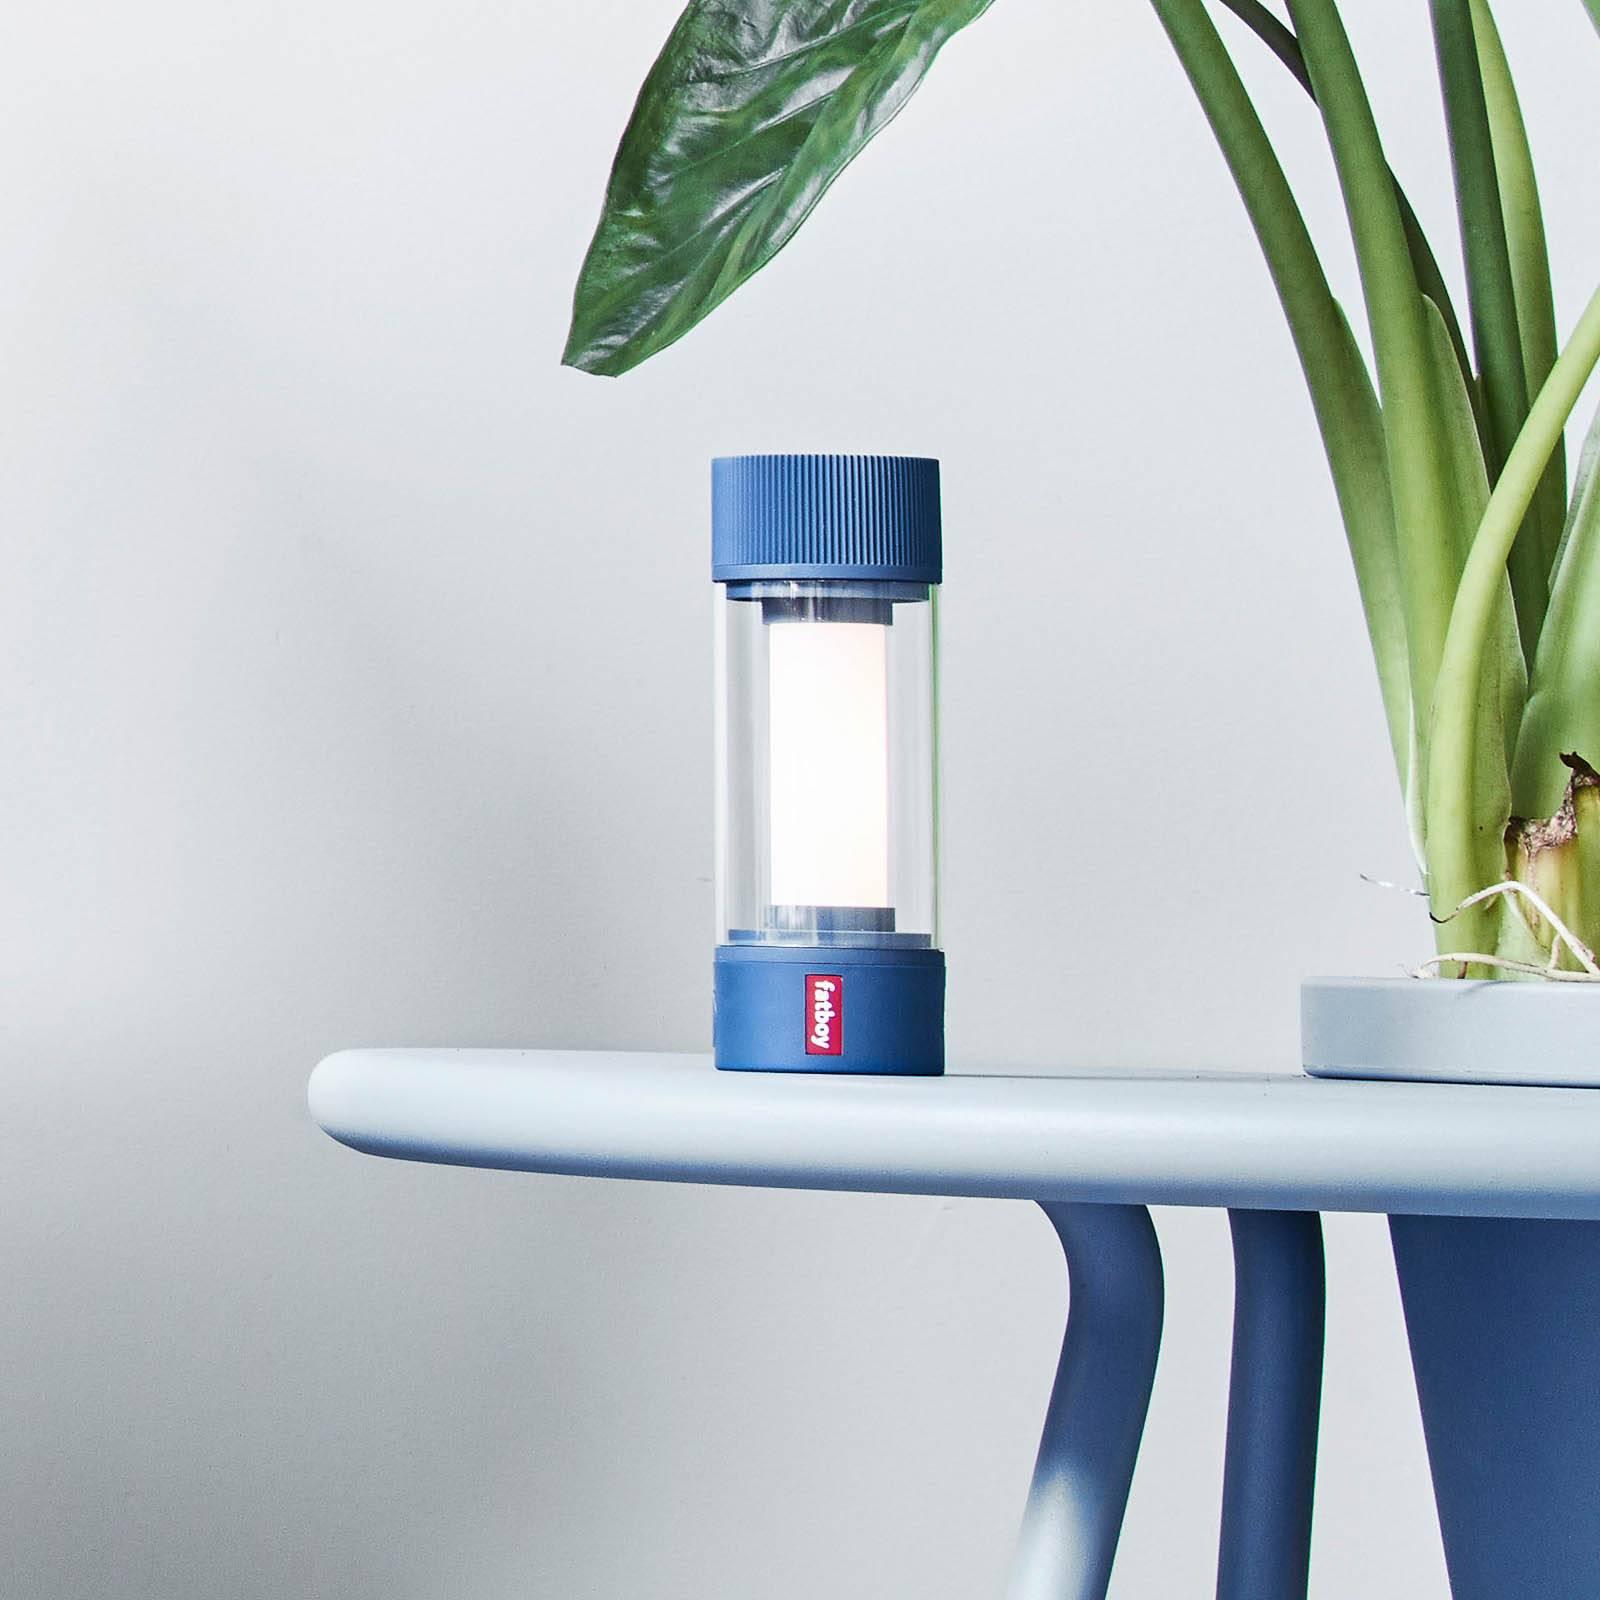 Fatboy LED-Tischleuchte Tjoepke mit Akku blau